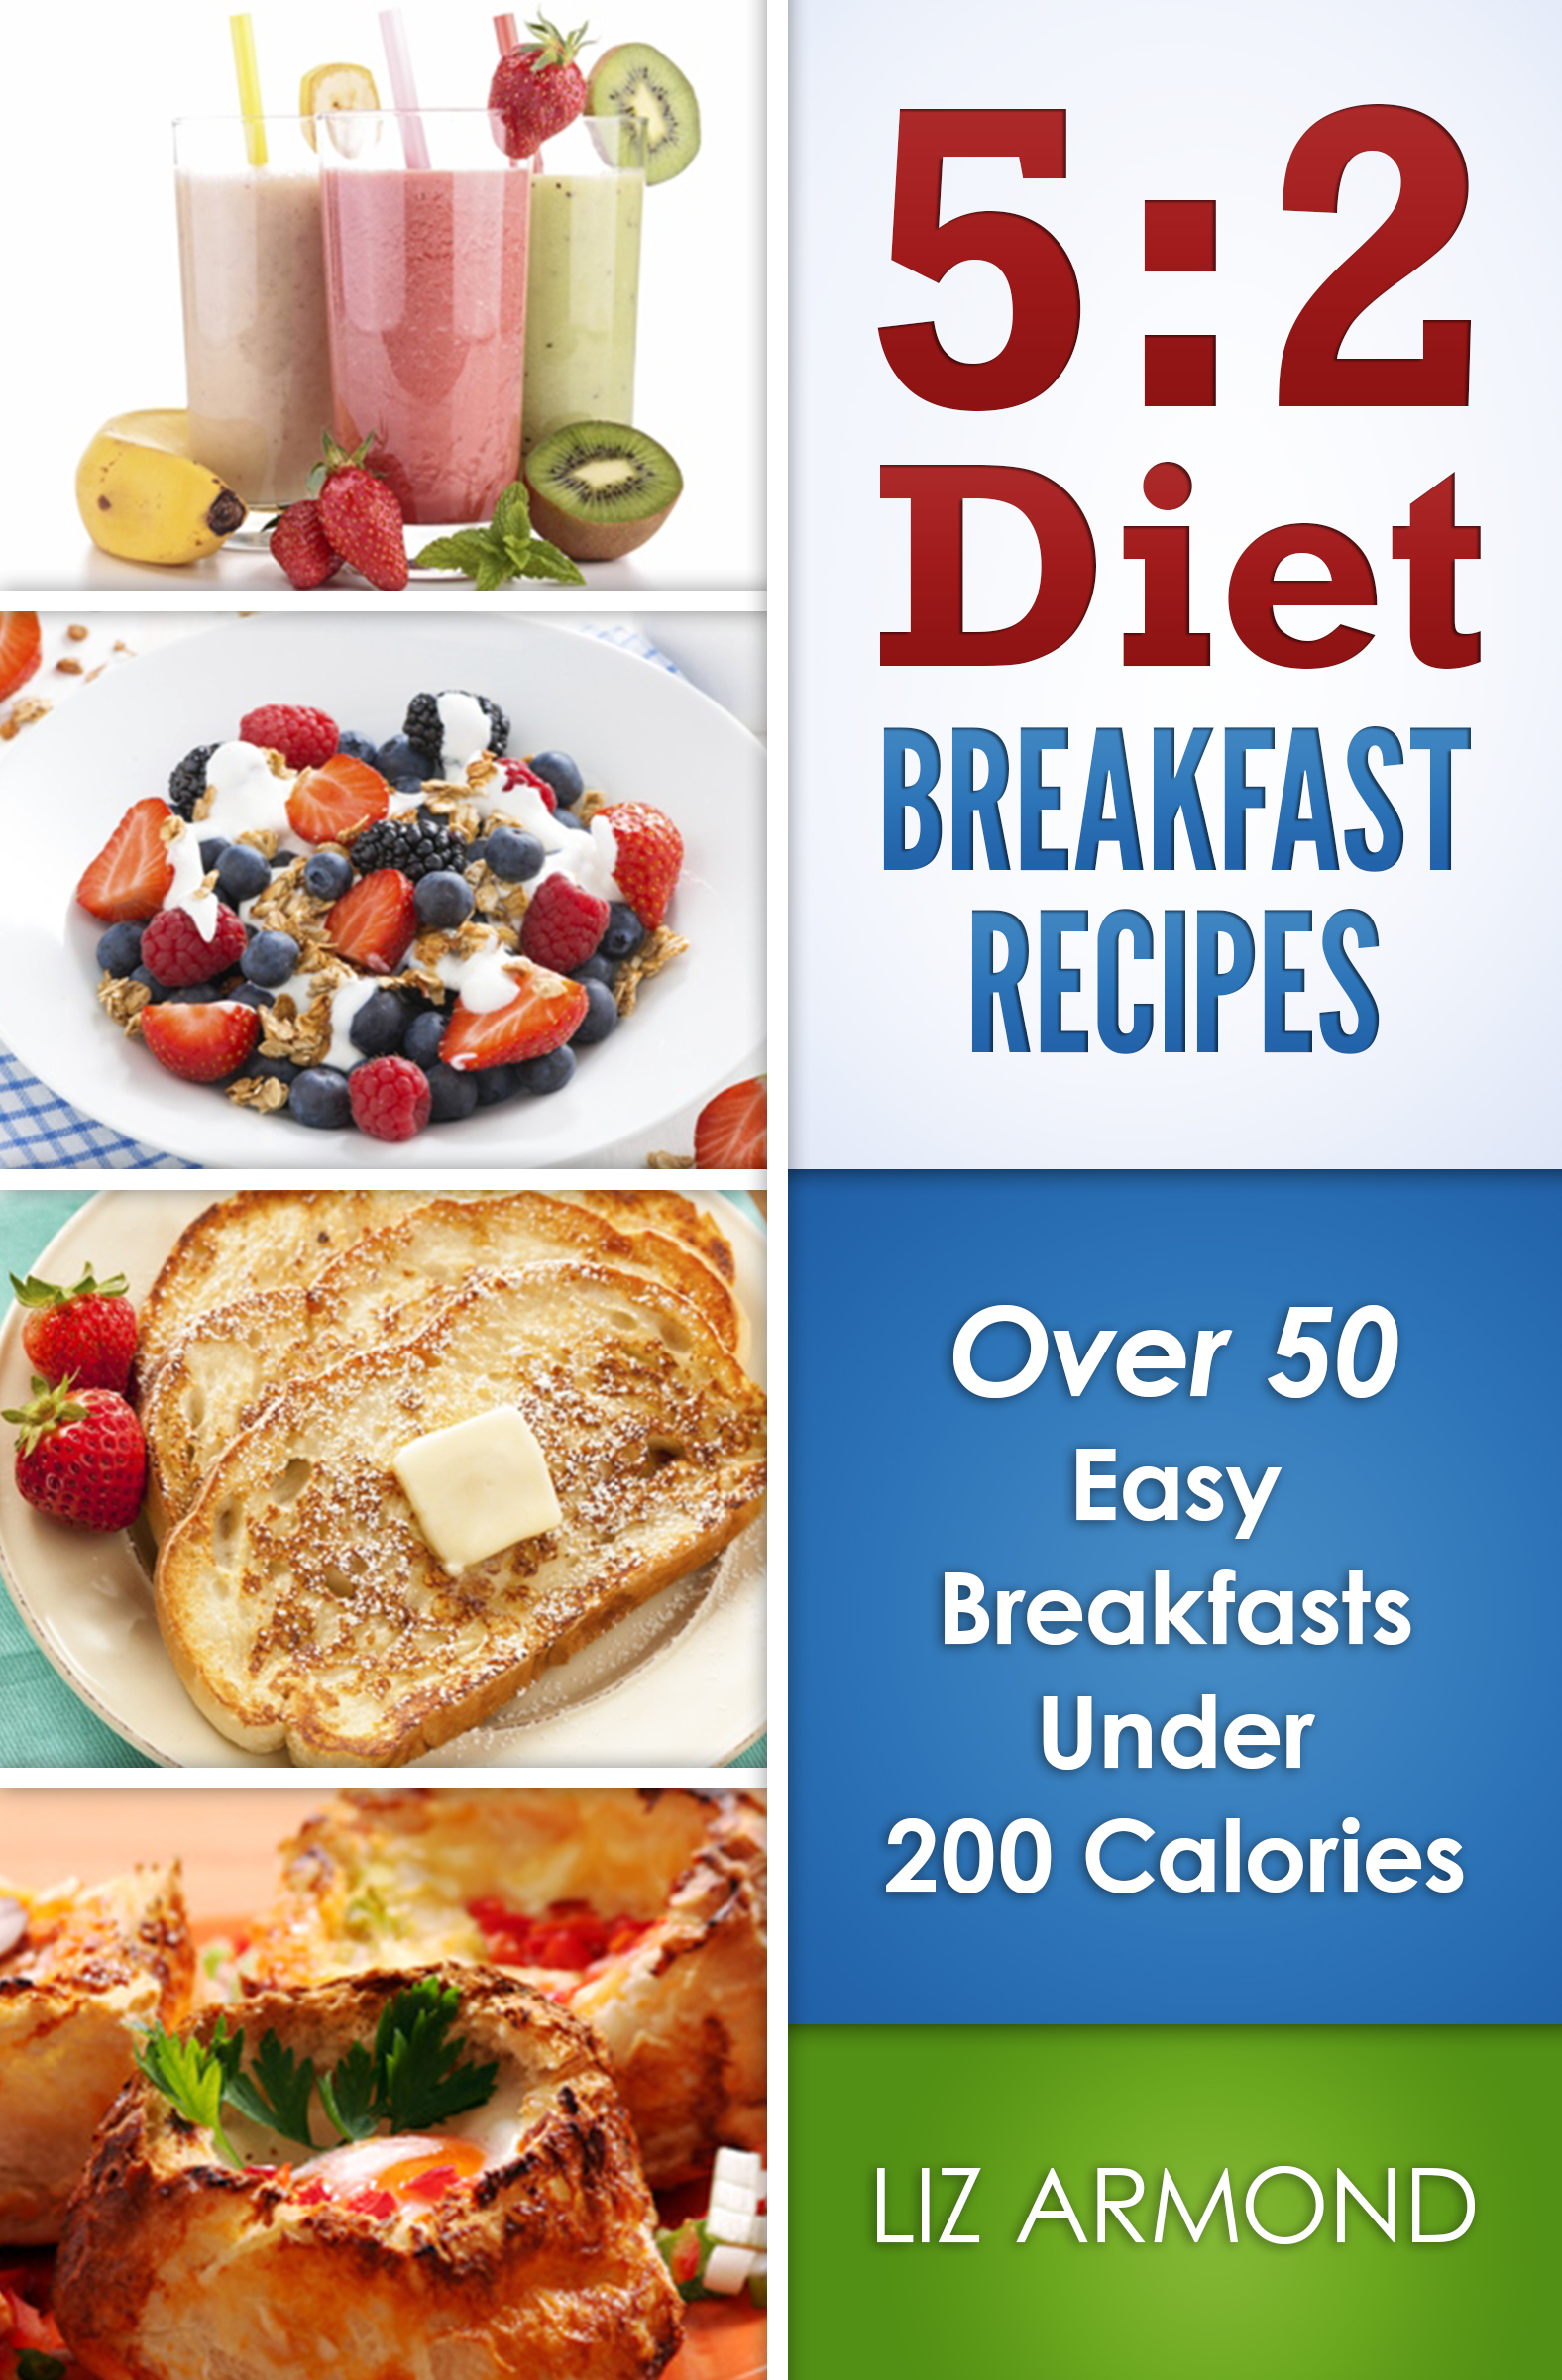 5.2 Diet Breakfast Recipes